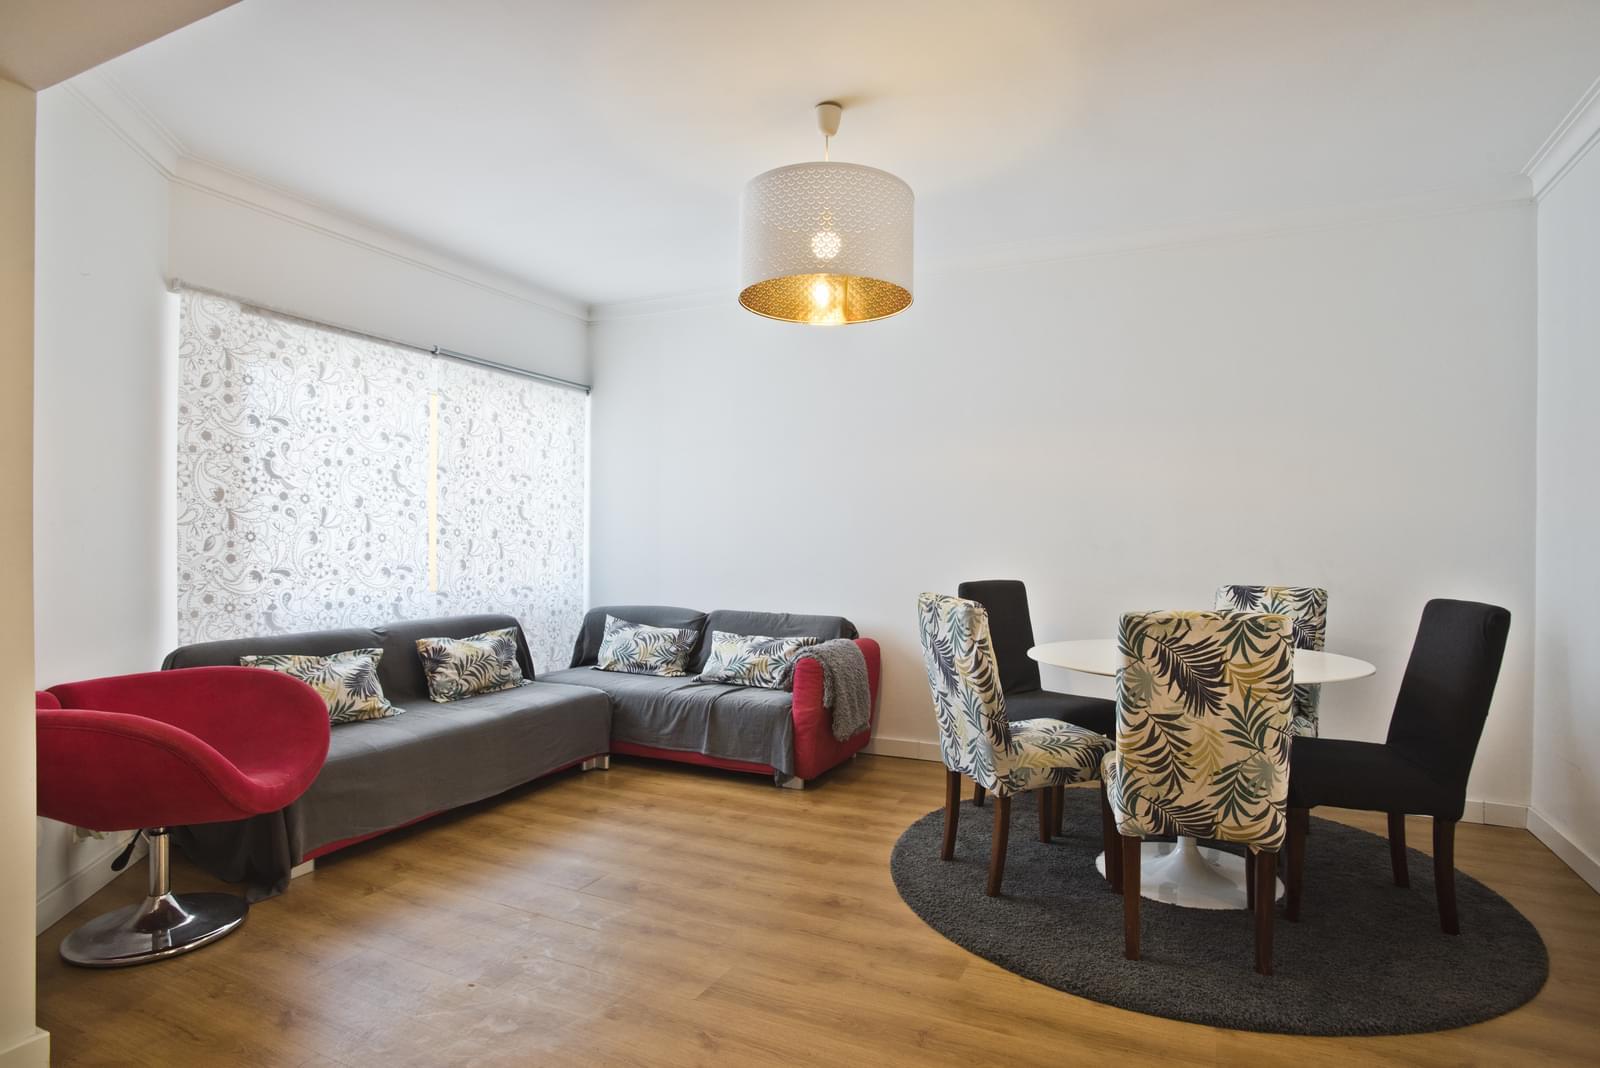 pf17010-apartamento-t4-cascais-be0b02e6-d929-456f-bb61-f40064b8aa30